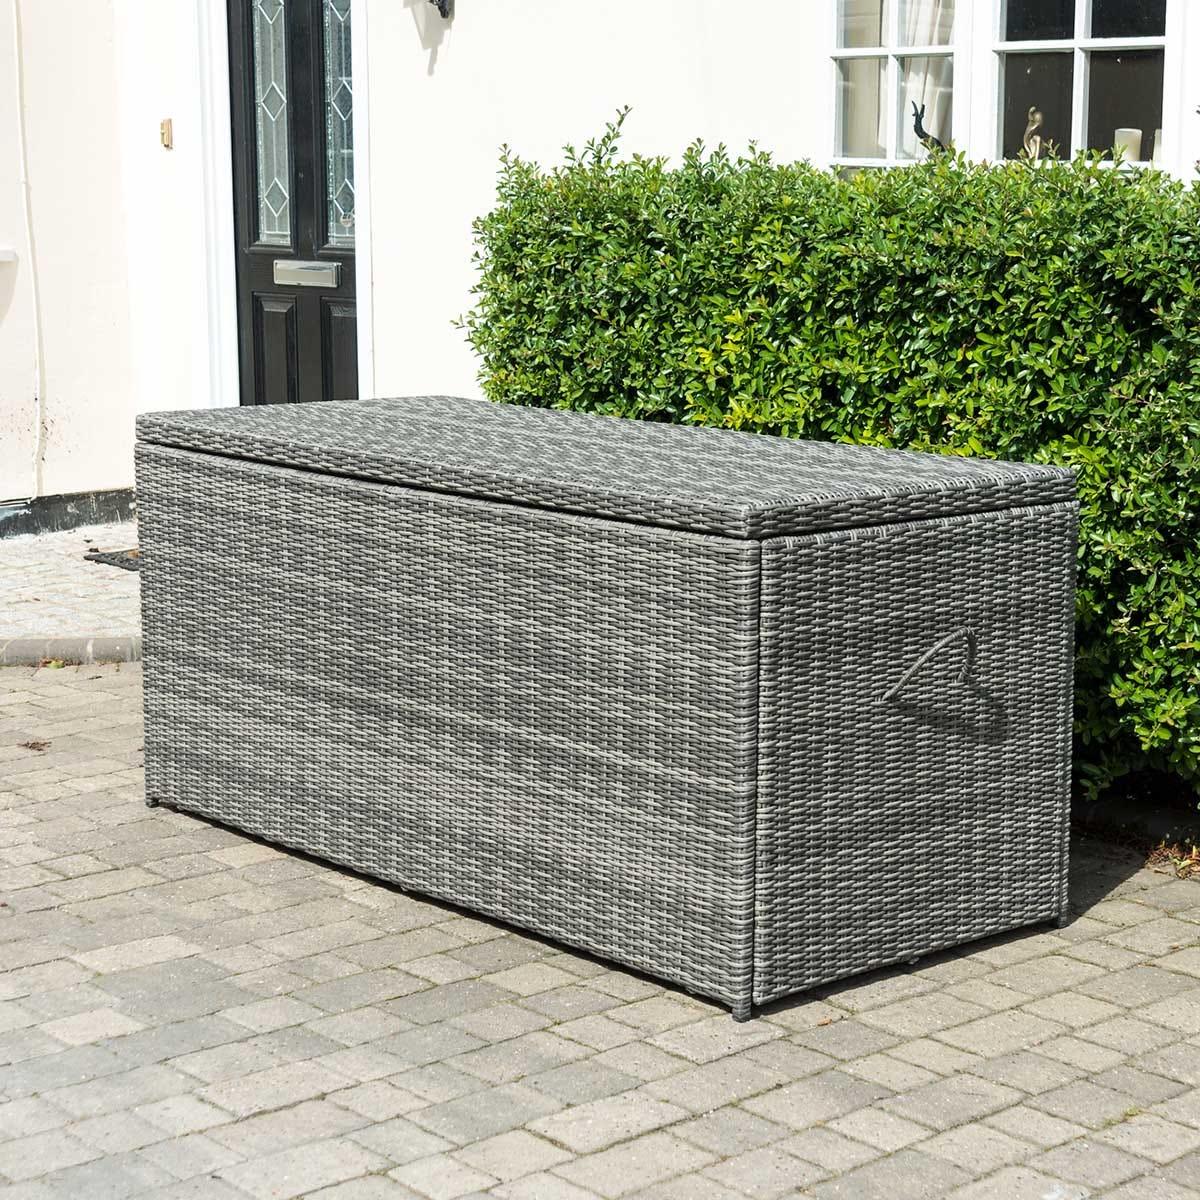 Glencrest Katie Blake Seville Extra Large Waterproof Cushion Storage Box - Grey